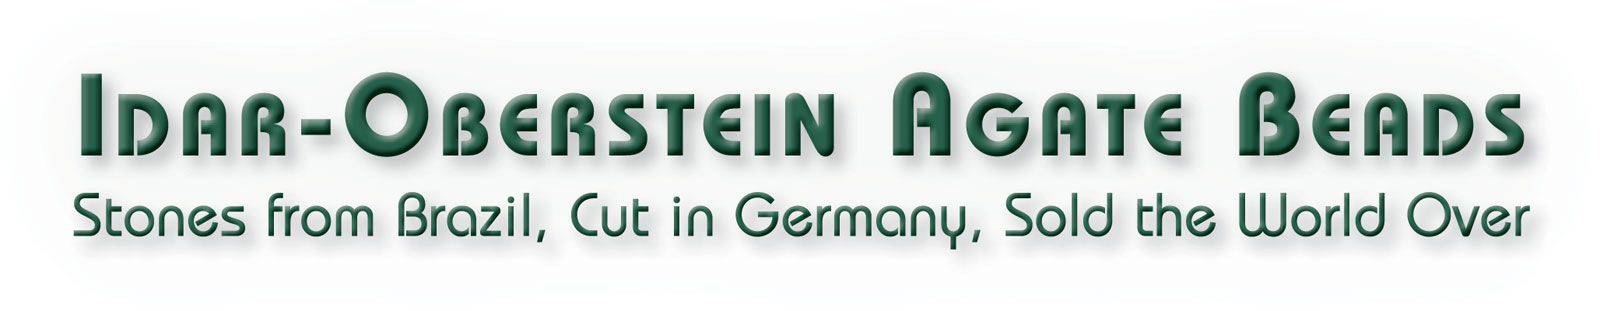 Idar-Oberstein-Title.jpg